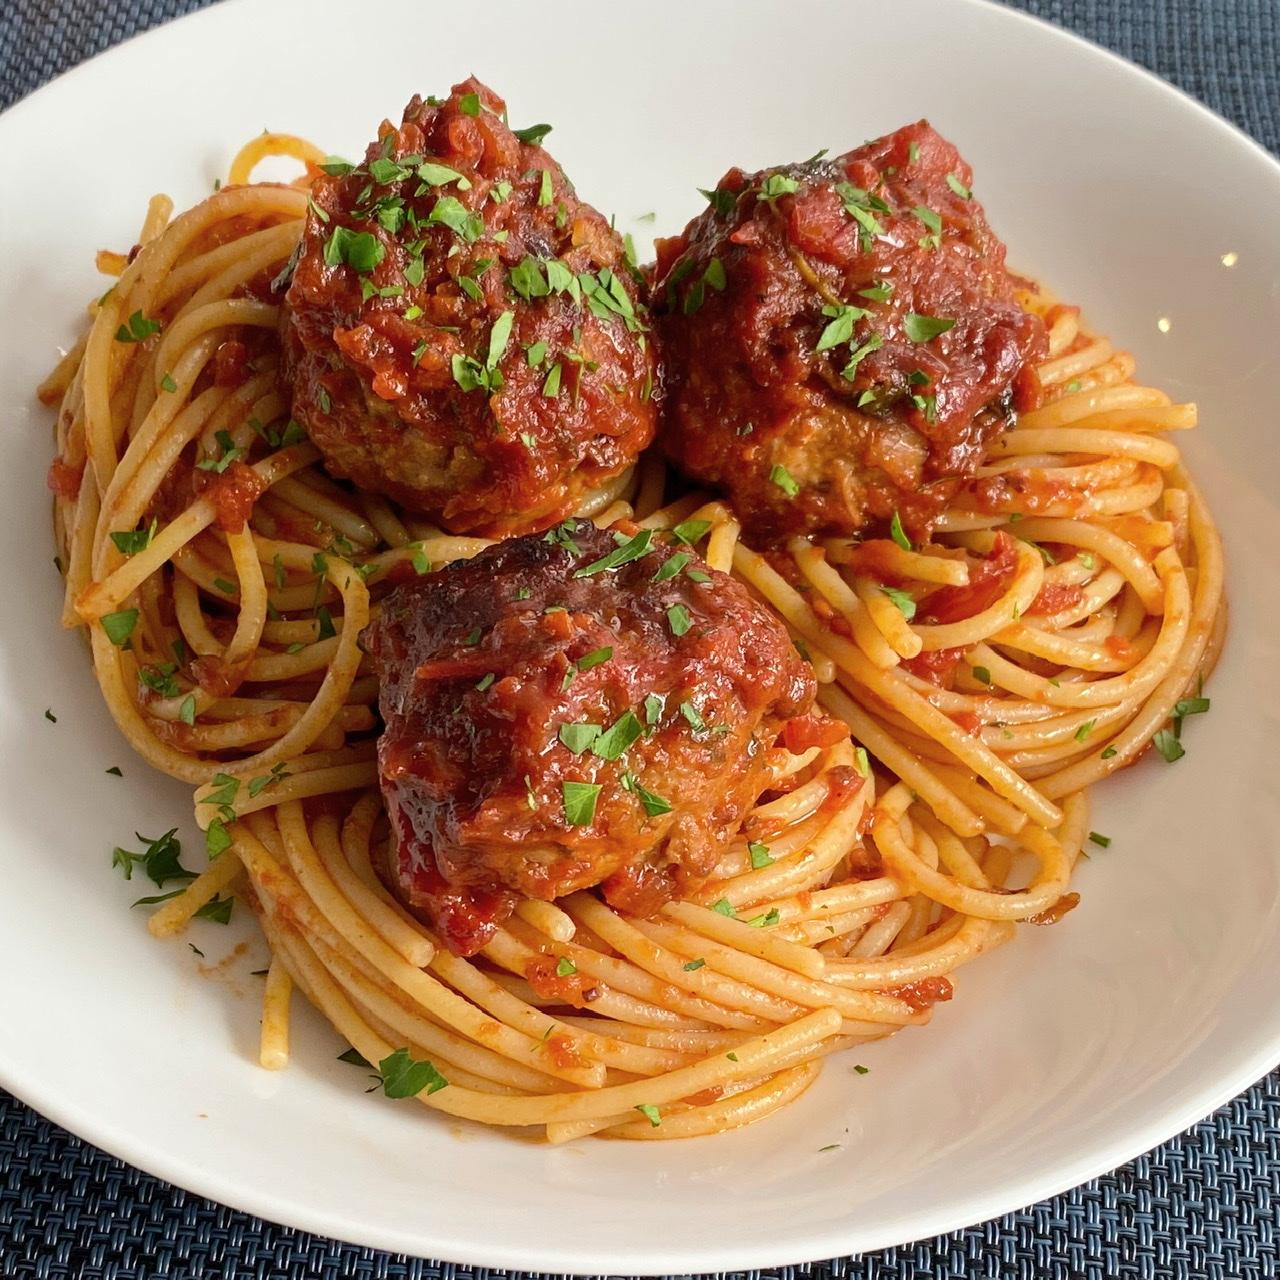 Vegan Spaghetti and (Beyond) Meatballs Buckwheat Queen